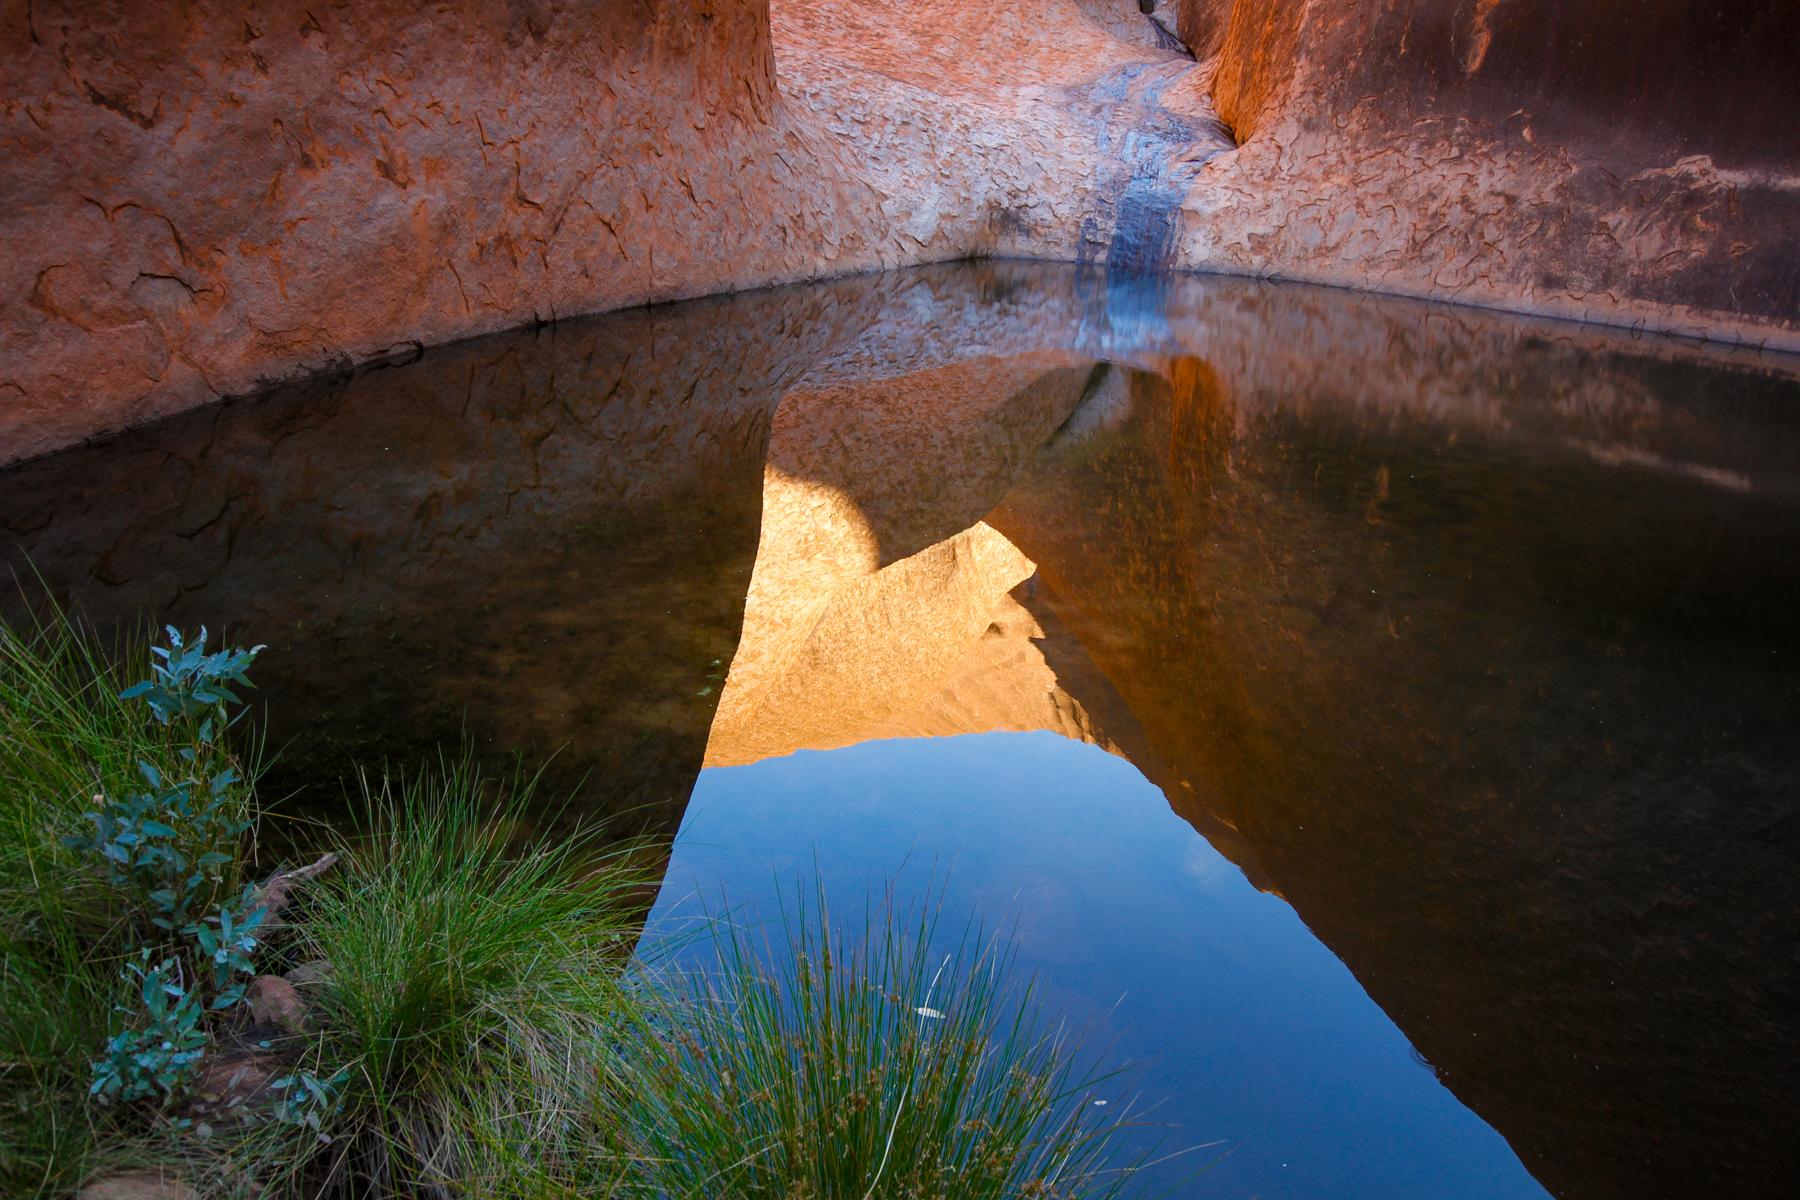 mg 1273 lr What to do in Uluru